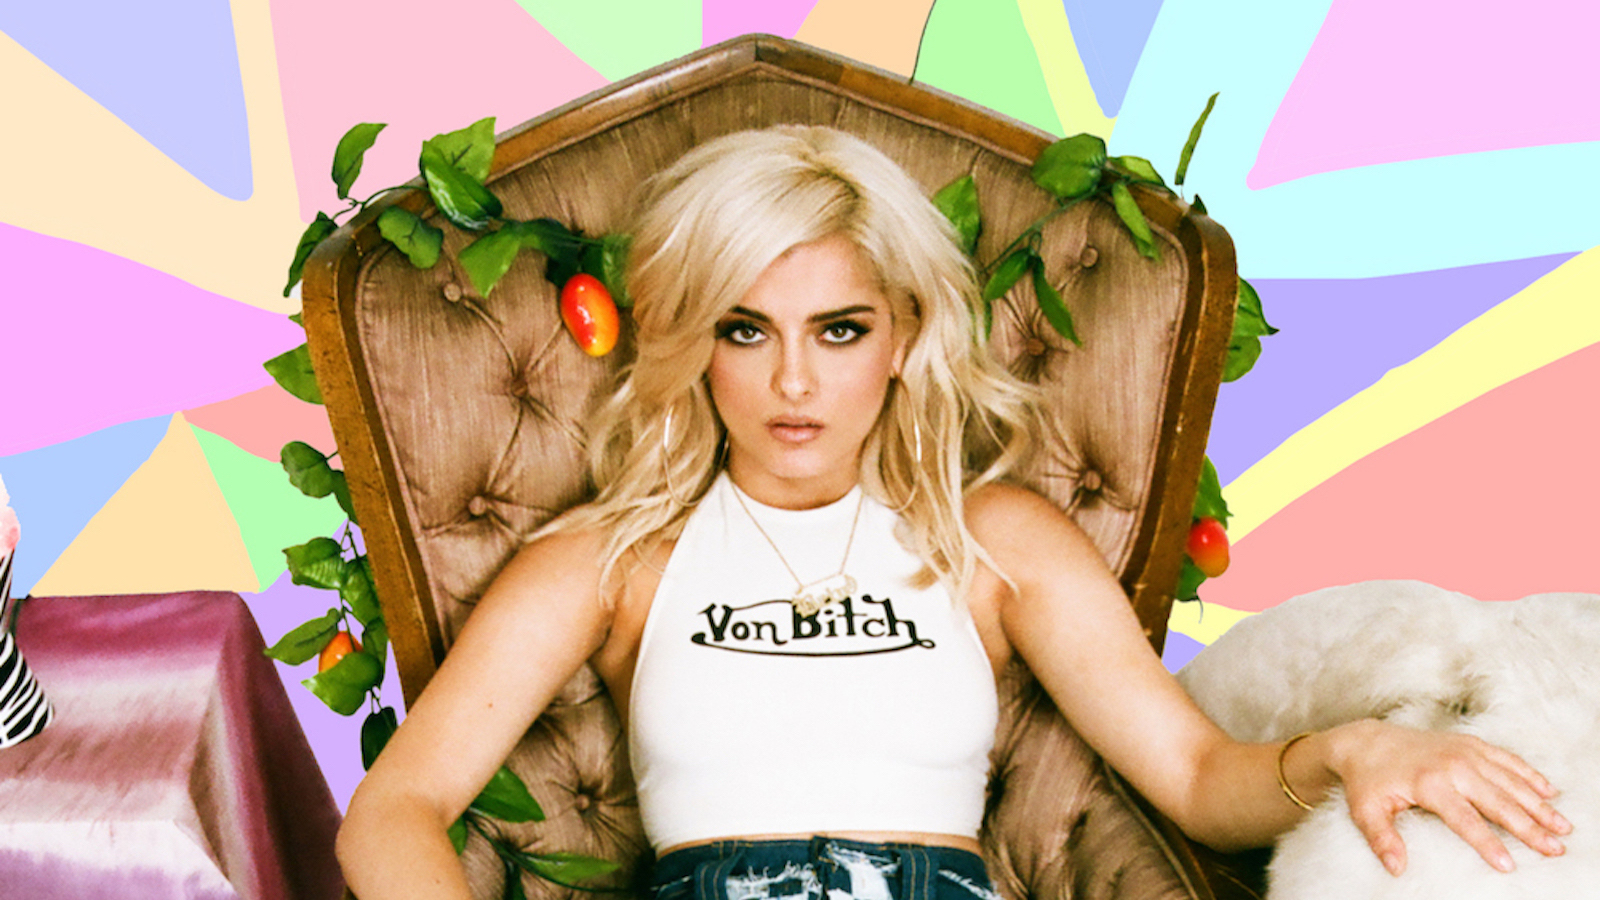 Tardis Girl Wallpaper Bebe Rexha Doesn T Want To Act More Feminine Thanks Galore